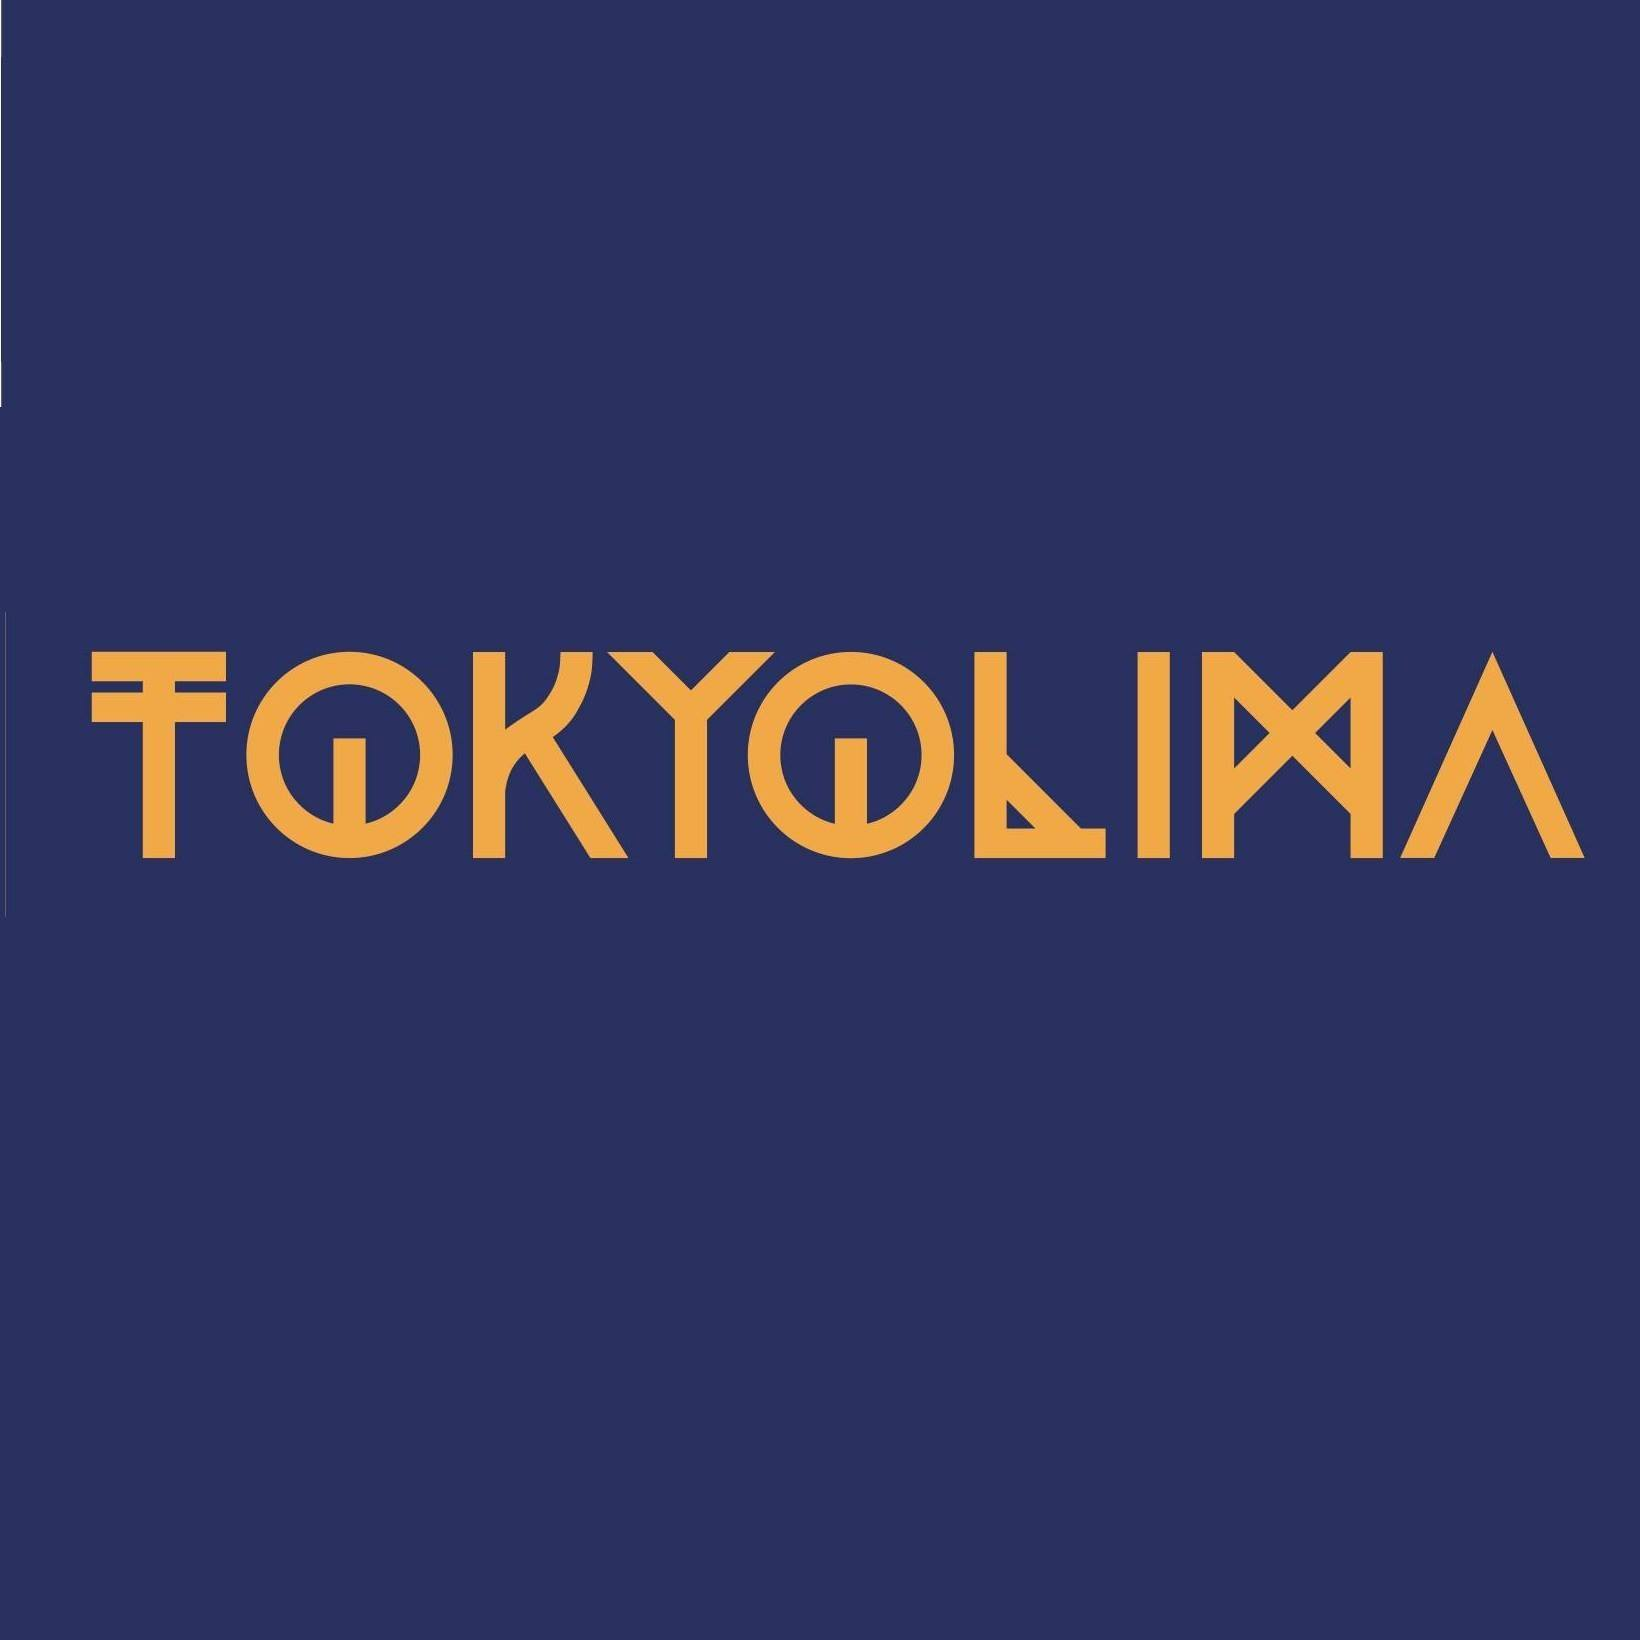 181018 Logo.jpg